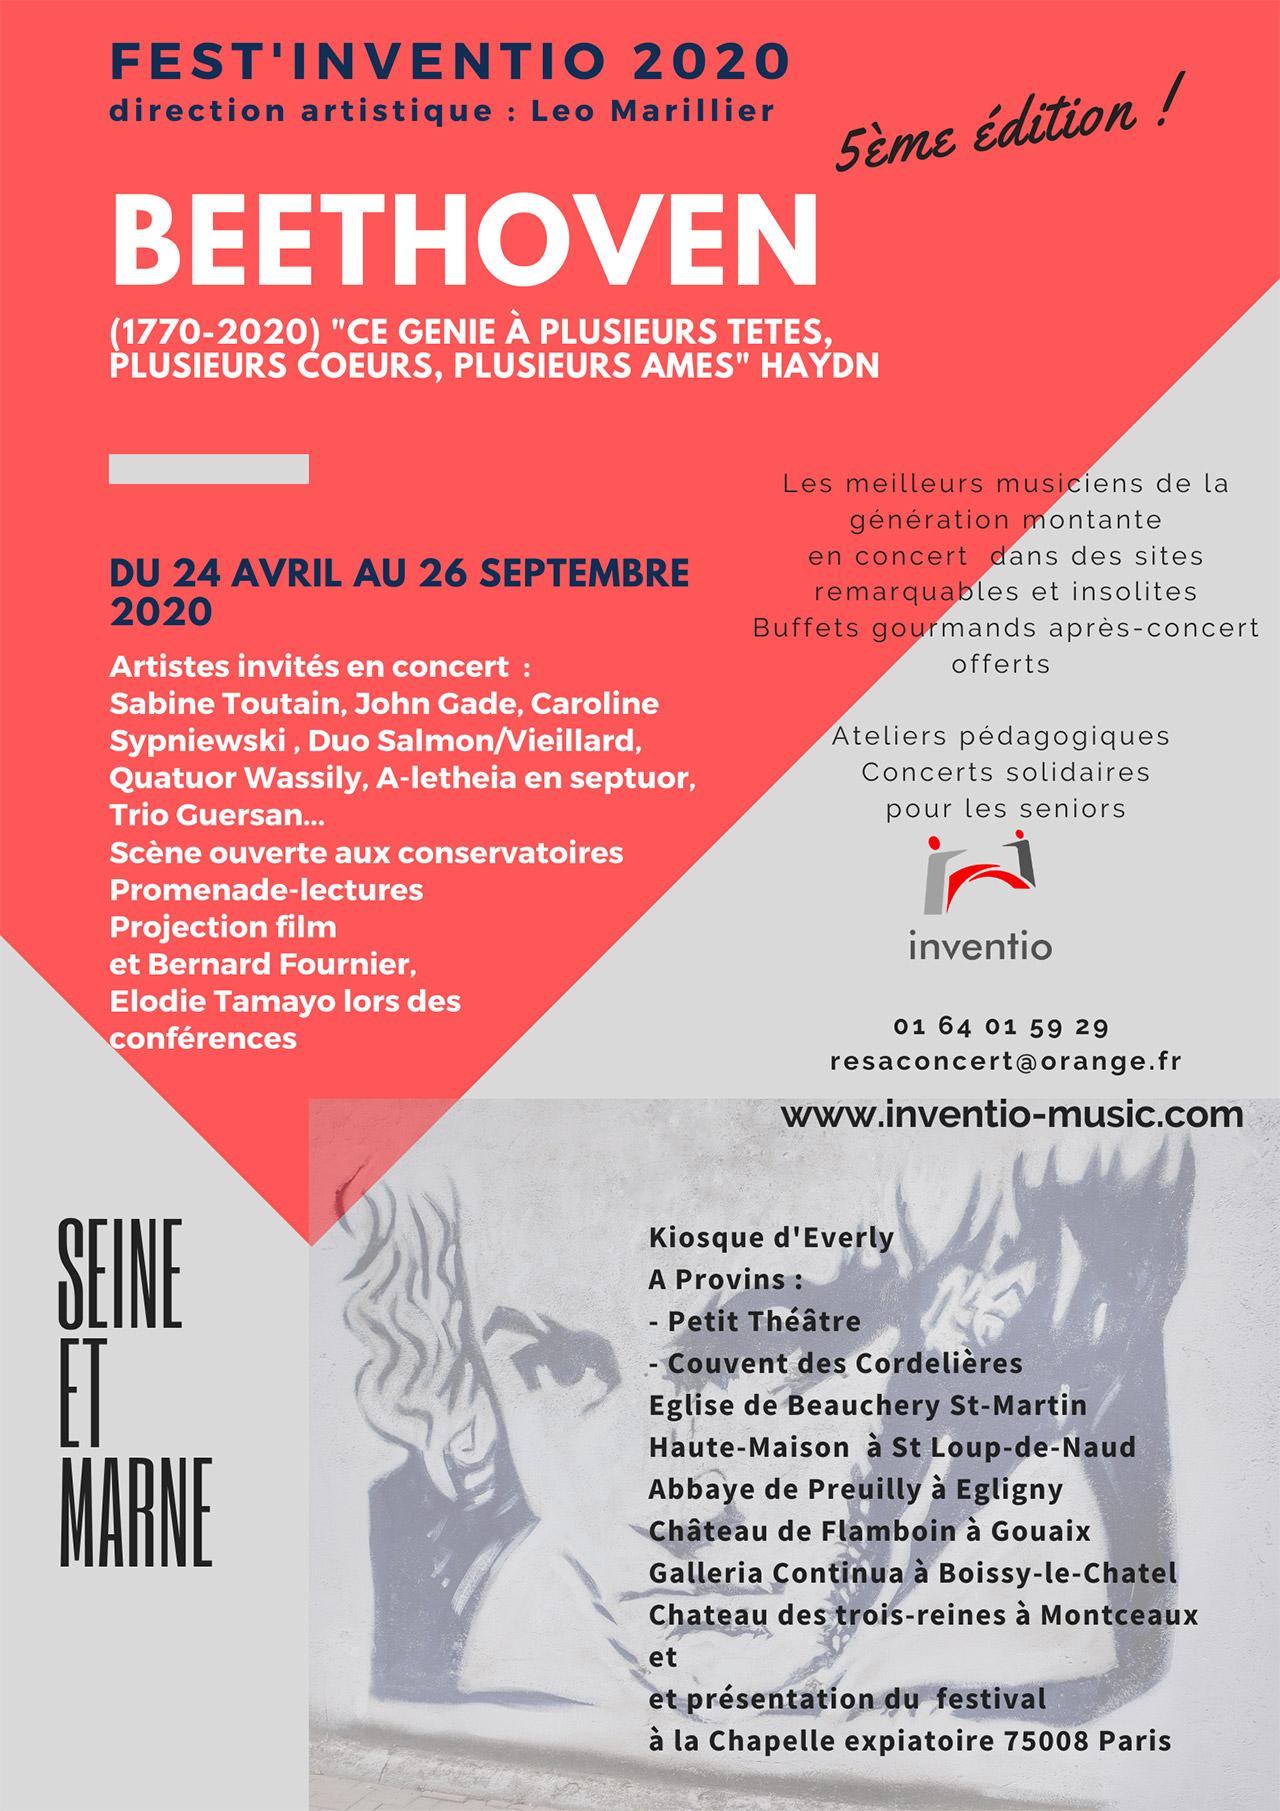 Edition 2020 Fest'inventio - Projection film « un grand amour de Beethoven »